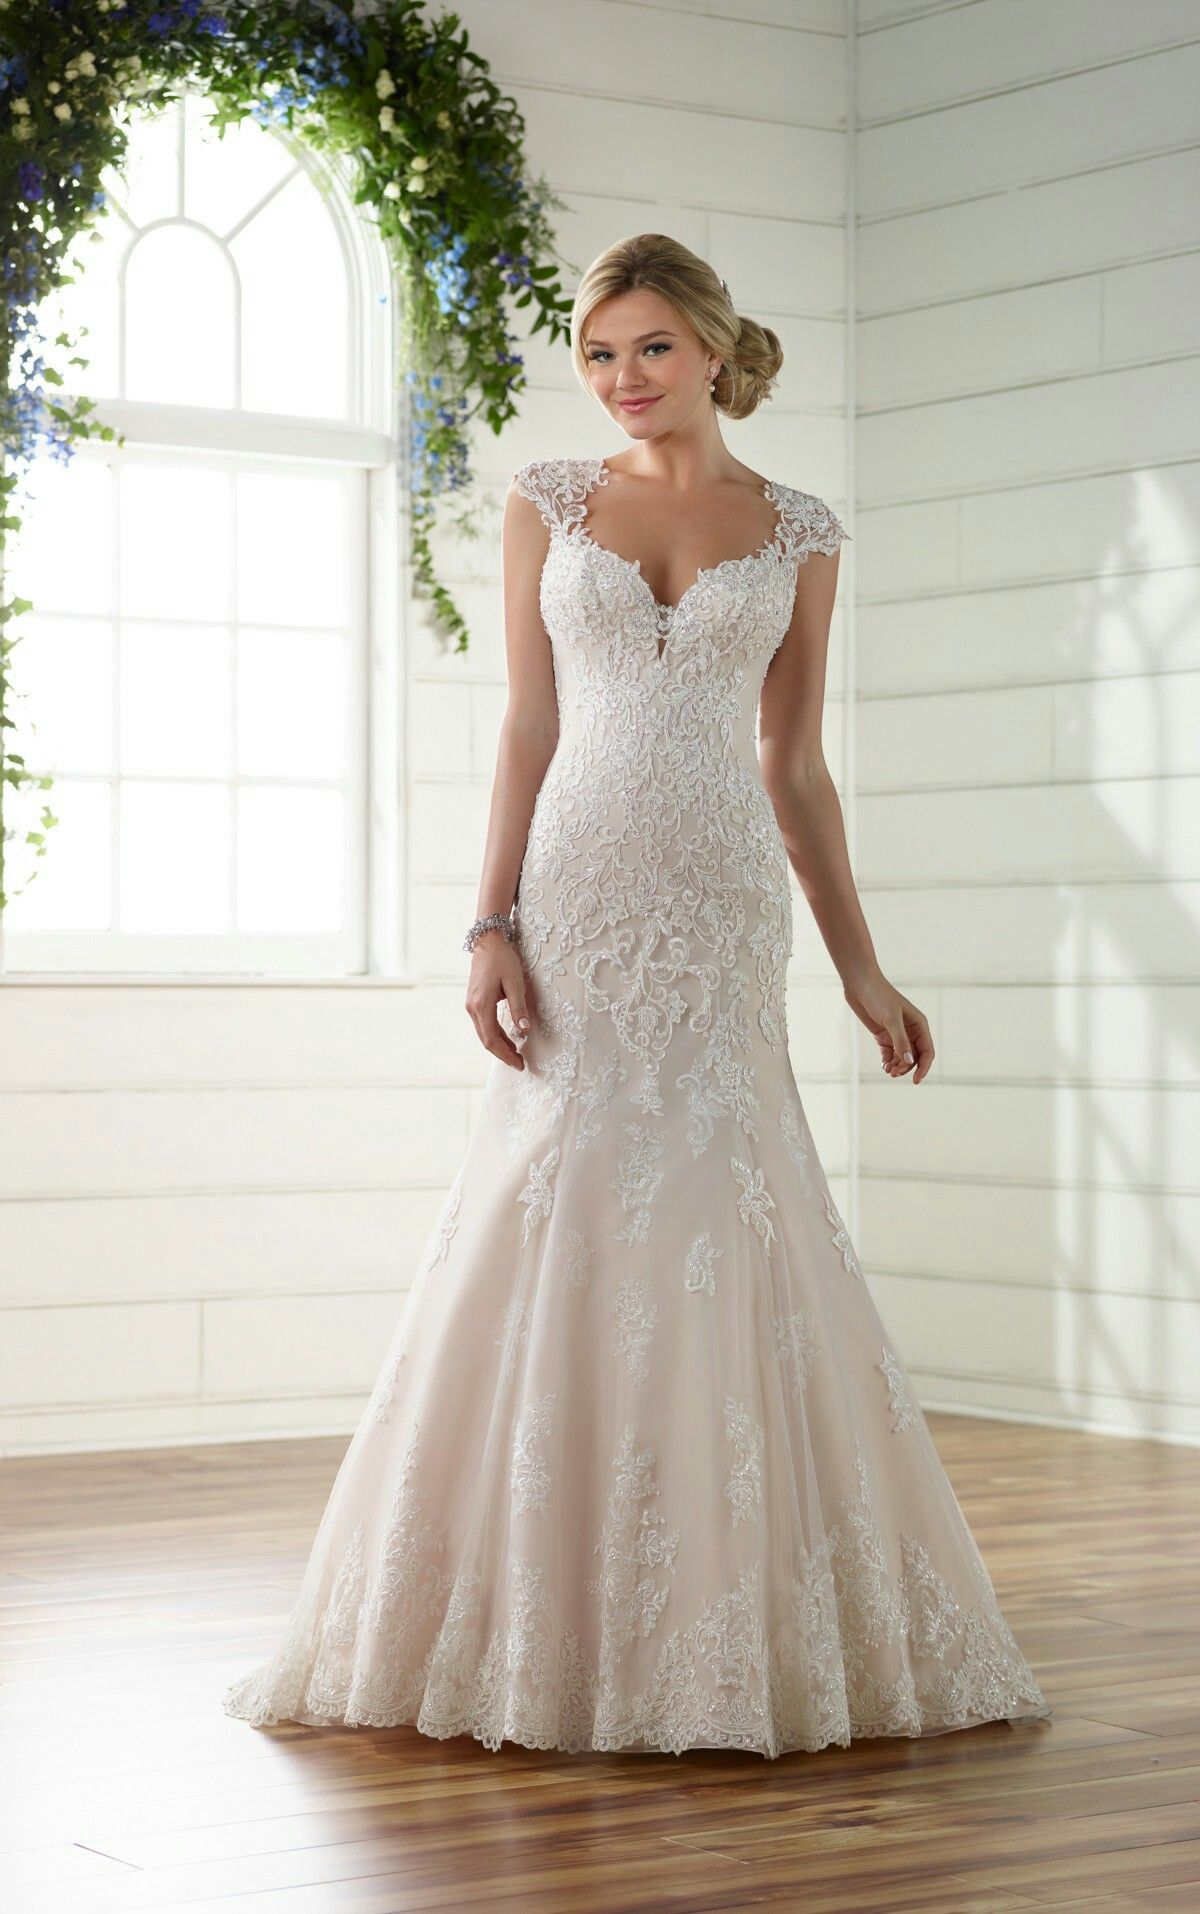 Pin by judith simmons on wedding dress pinterest wedding dress